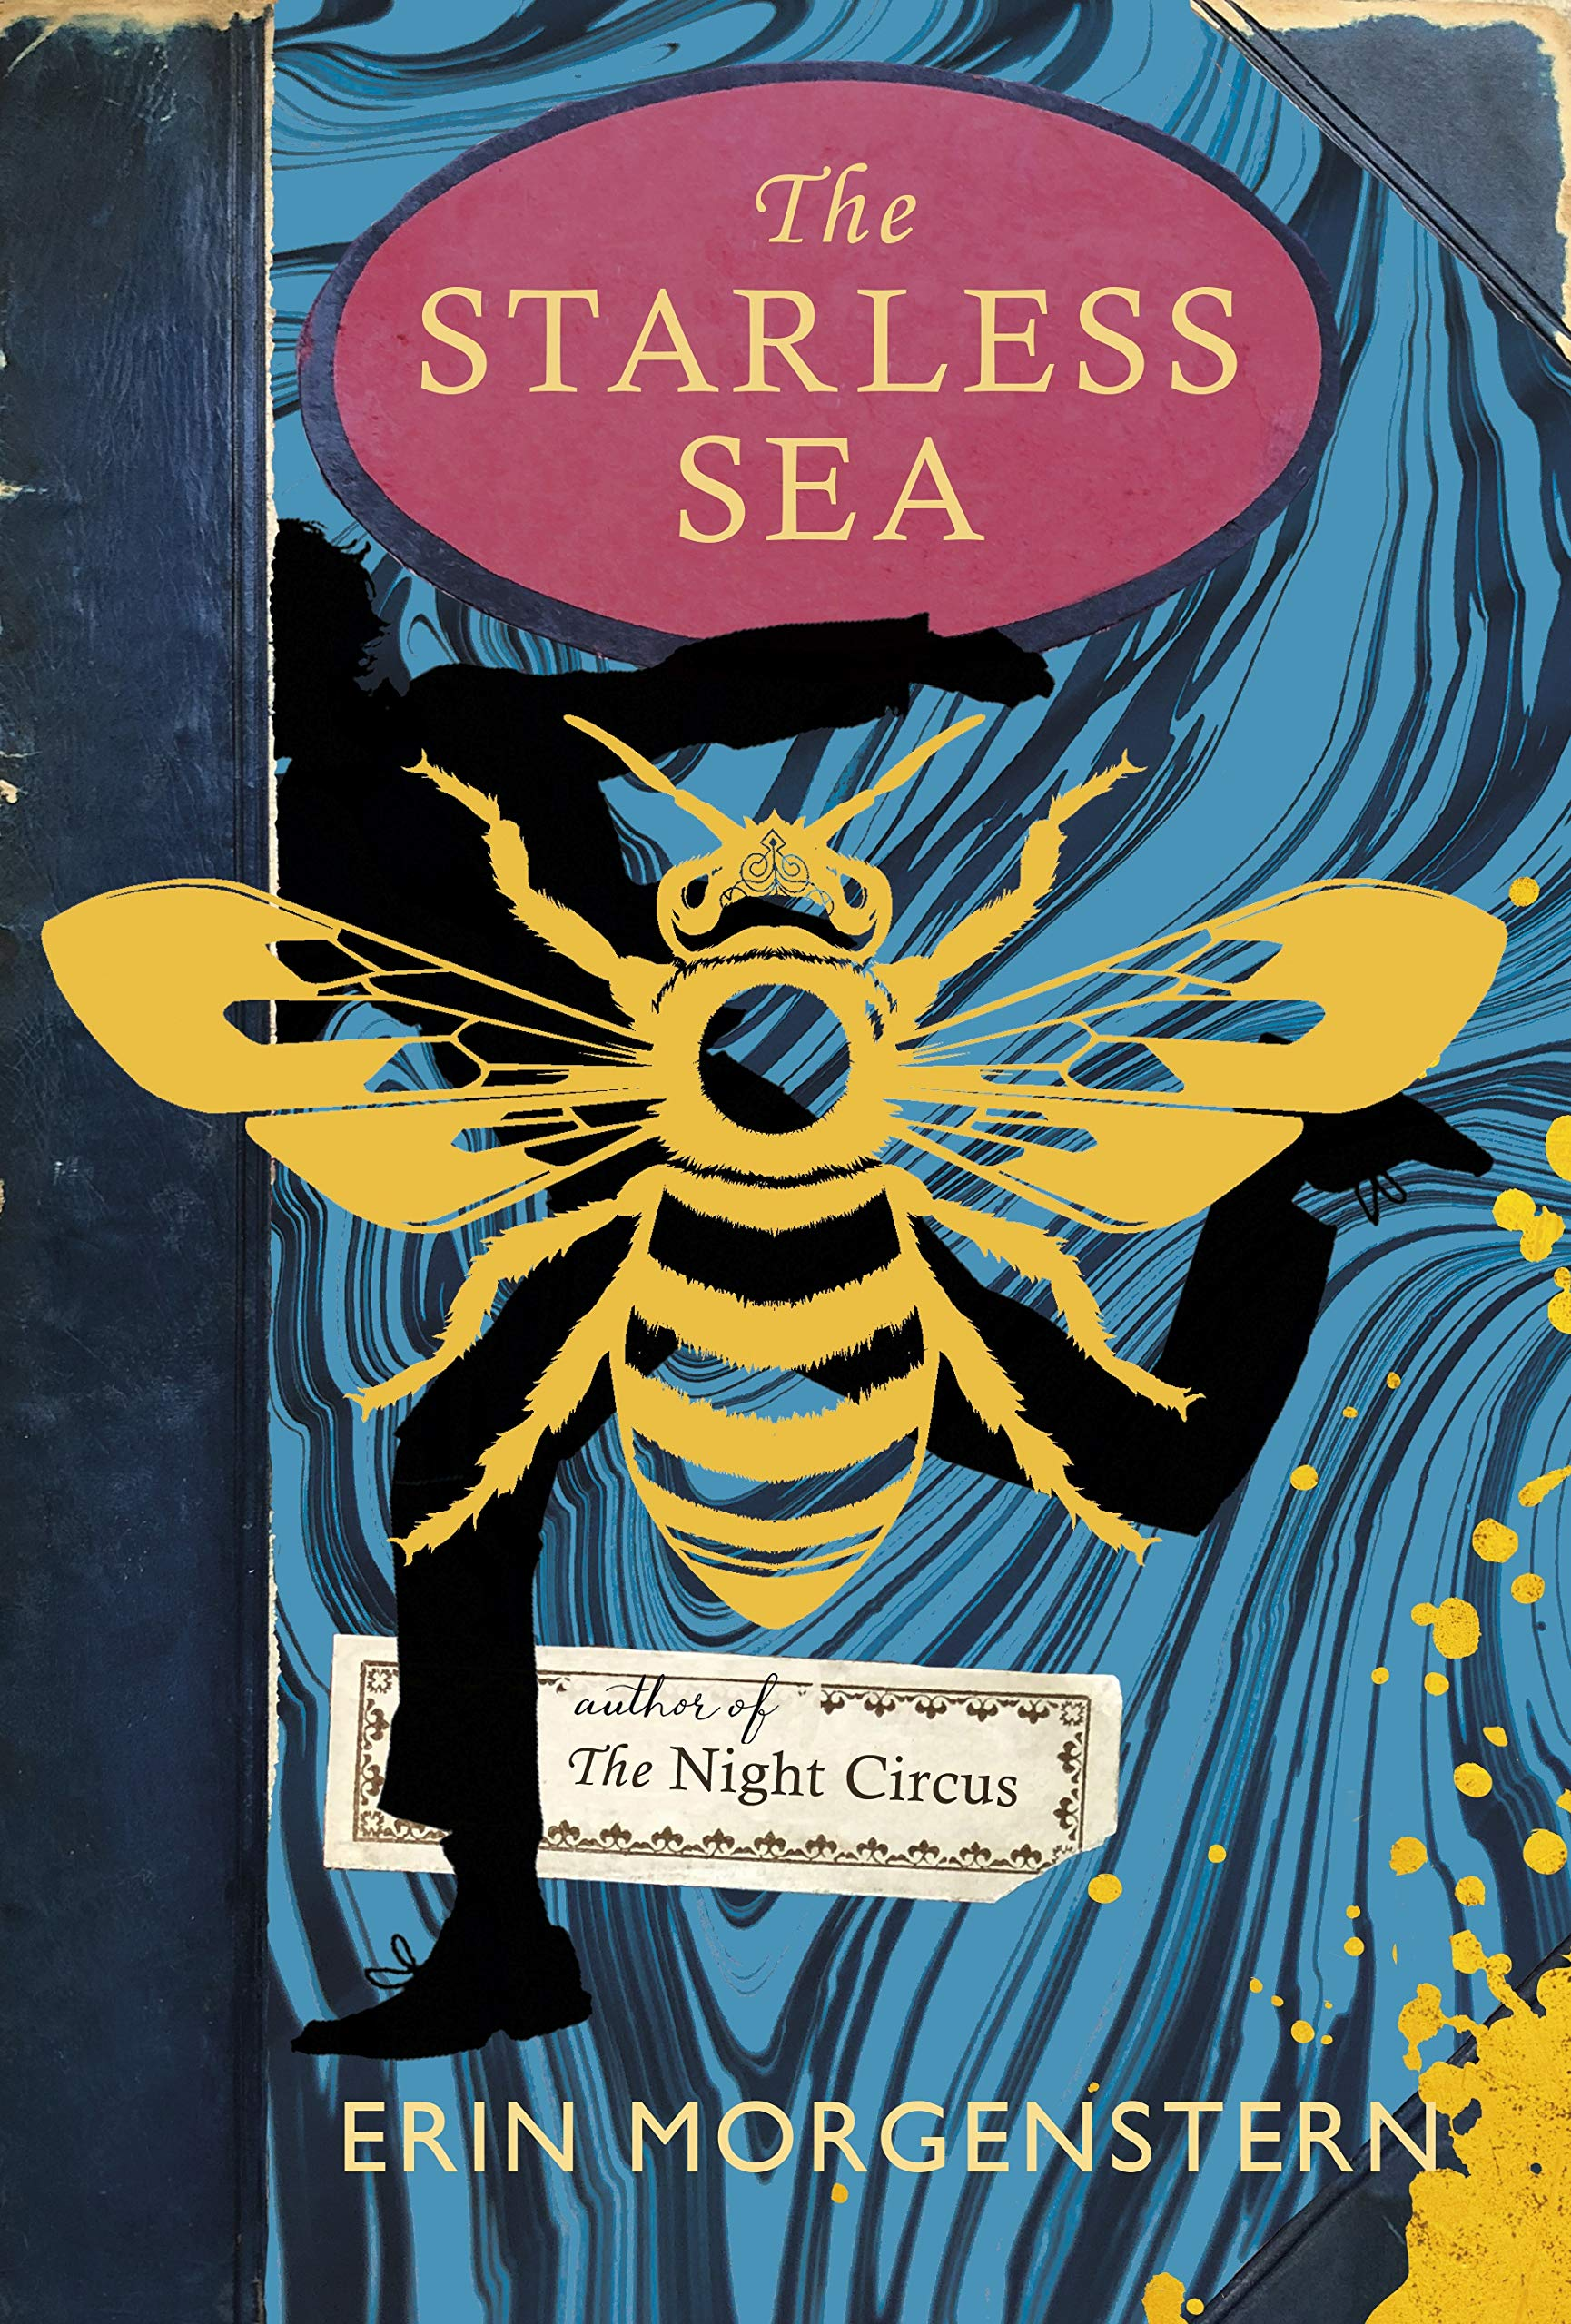 The Starless Sea: Amazon.co.uk: Morgenstern, Erin: 9781910701454 ...